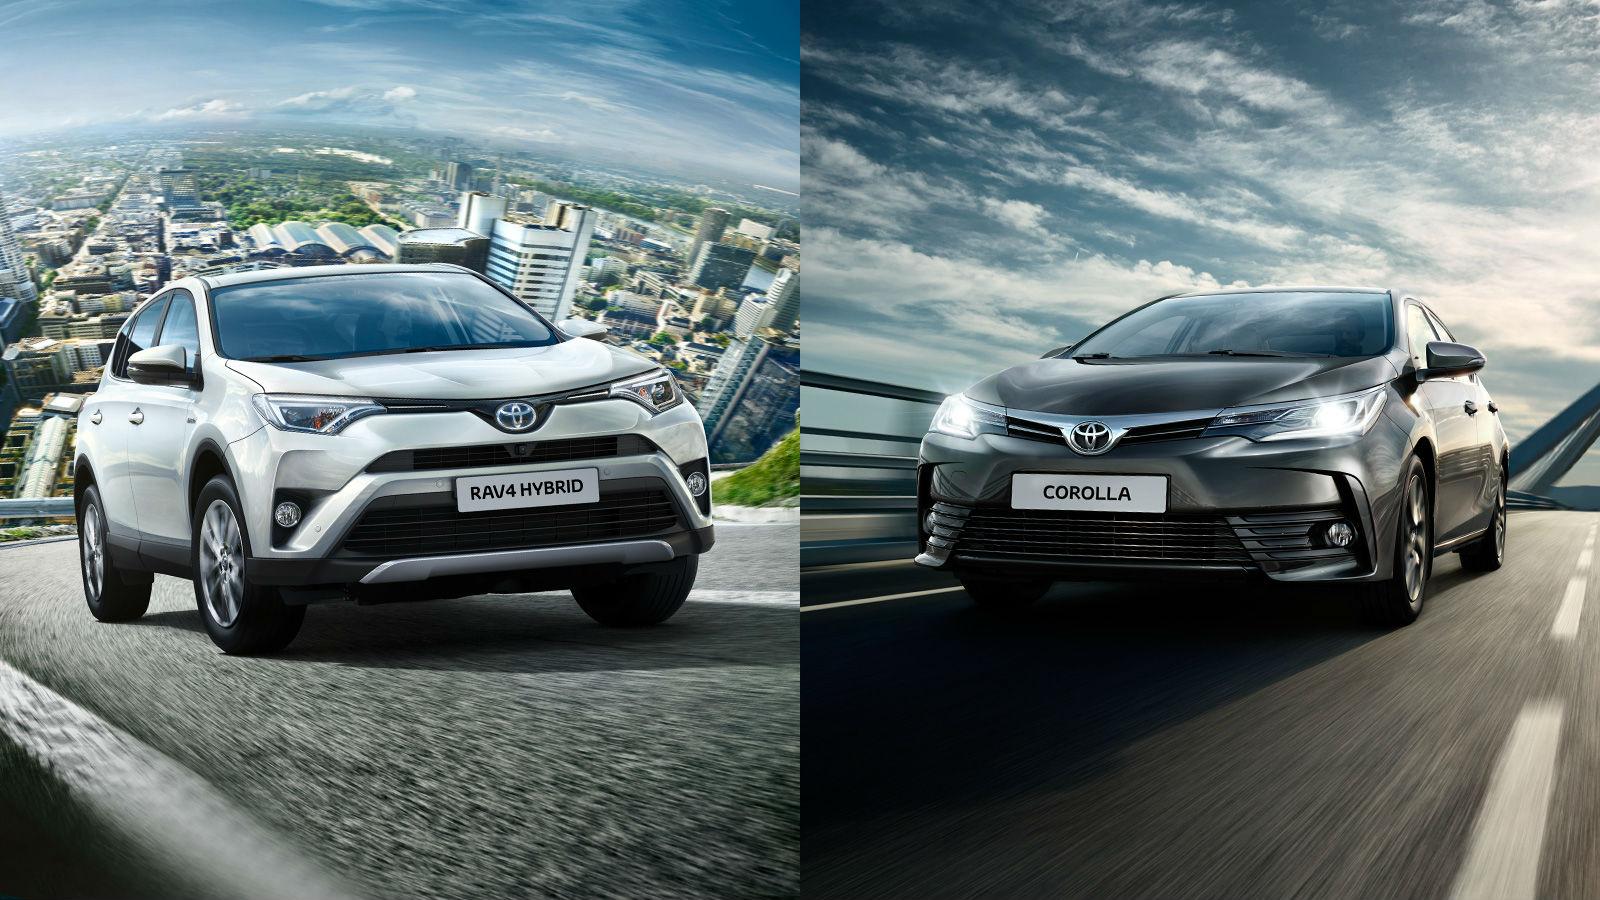 https://t1-cms-4.images.toyota-europe.com/toyotaone/uaua/Corolla-rav4-hybrid-winners-1600x900_tcm-3046-902303.jpg